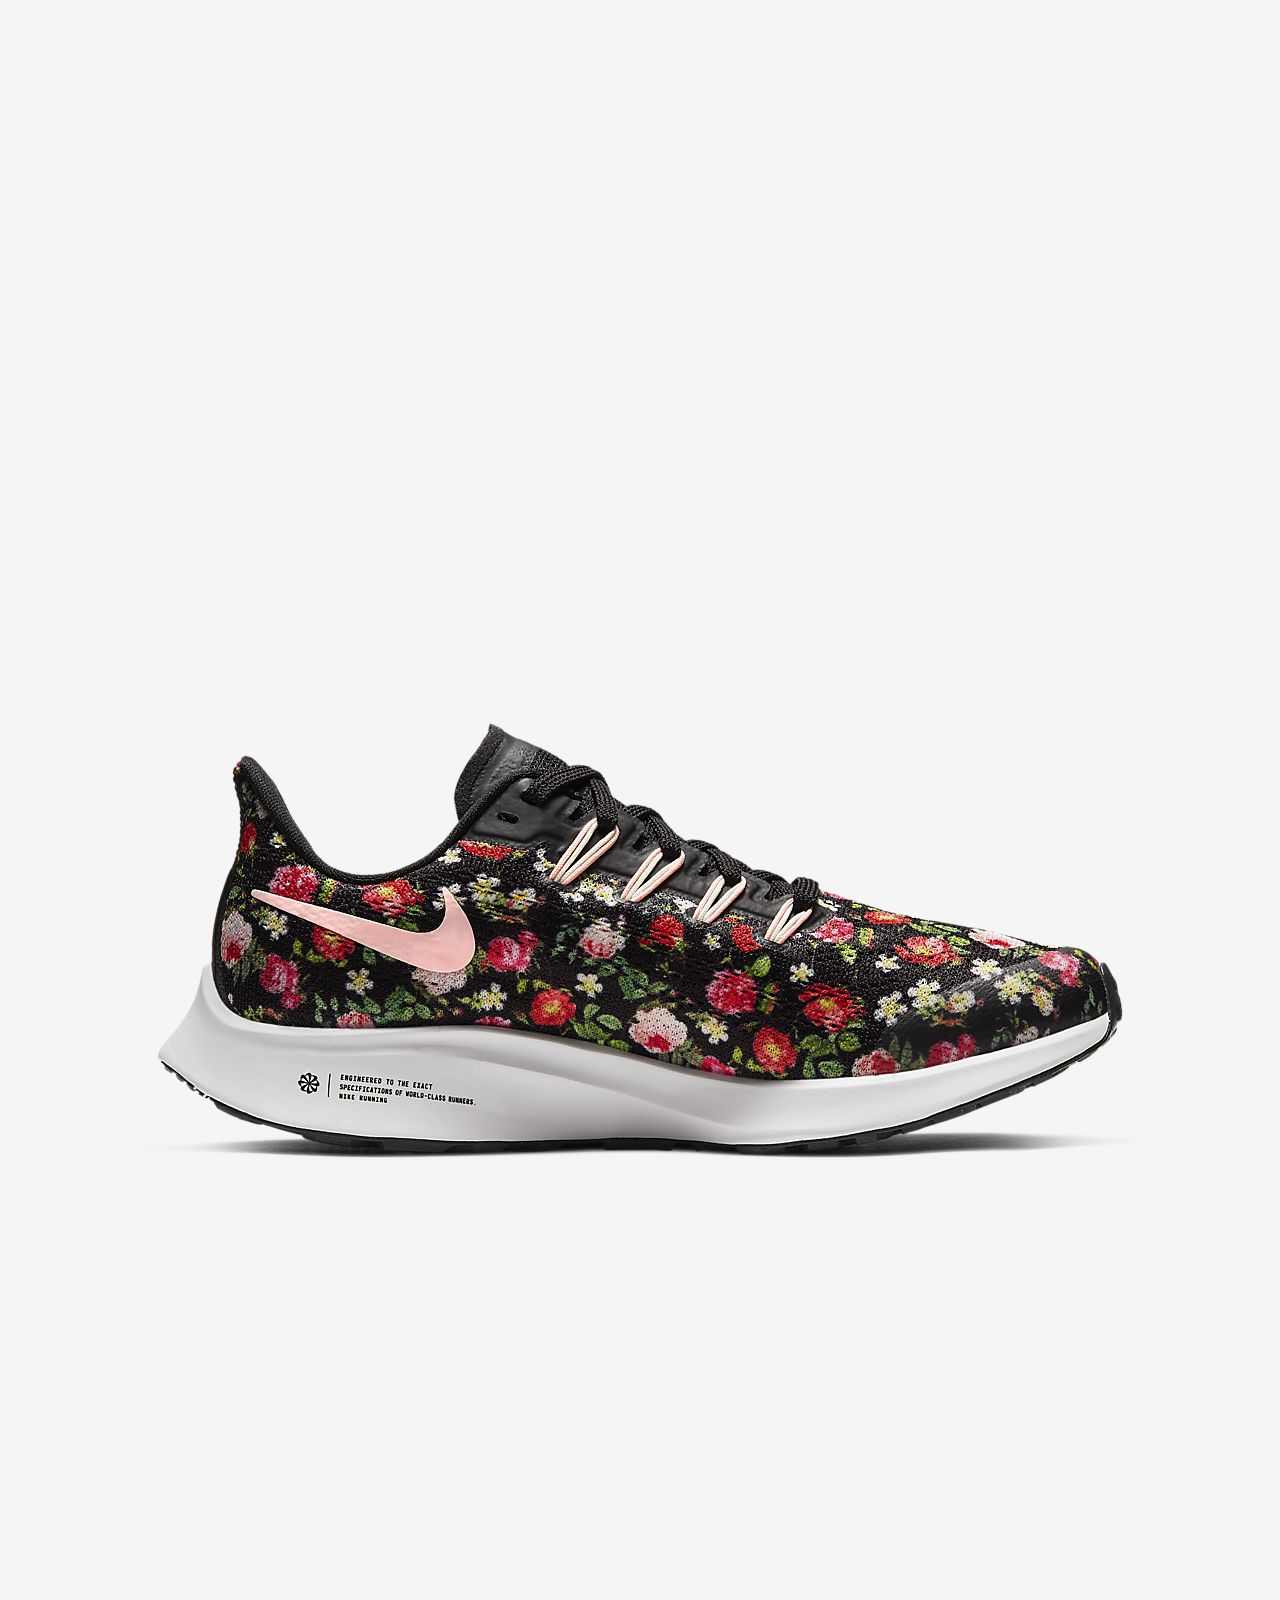 Dames Nike Air Zoom Pegasus 34 Rennen Schoenen